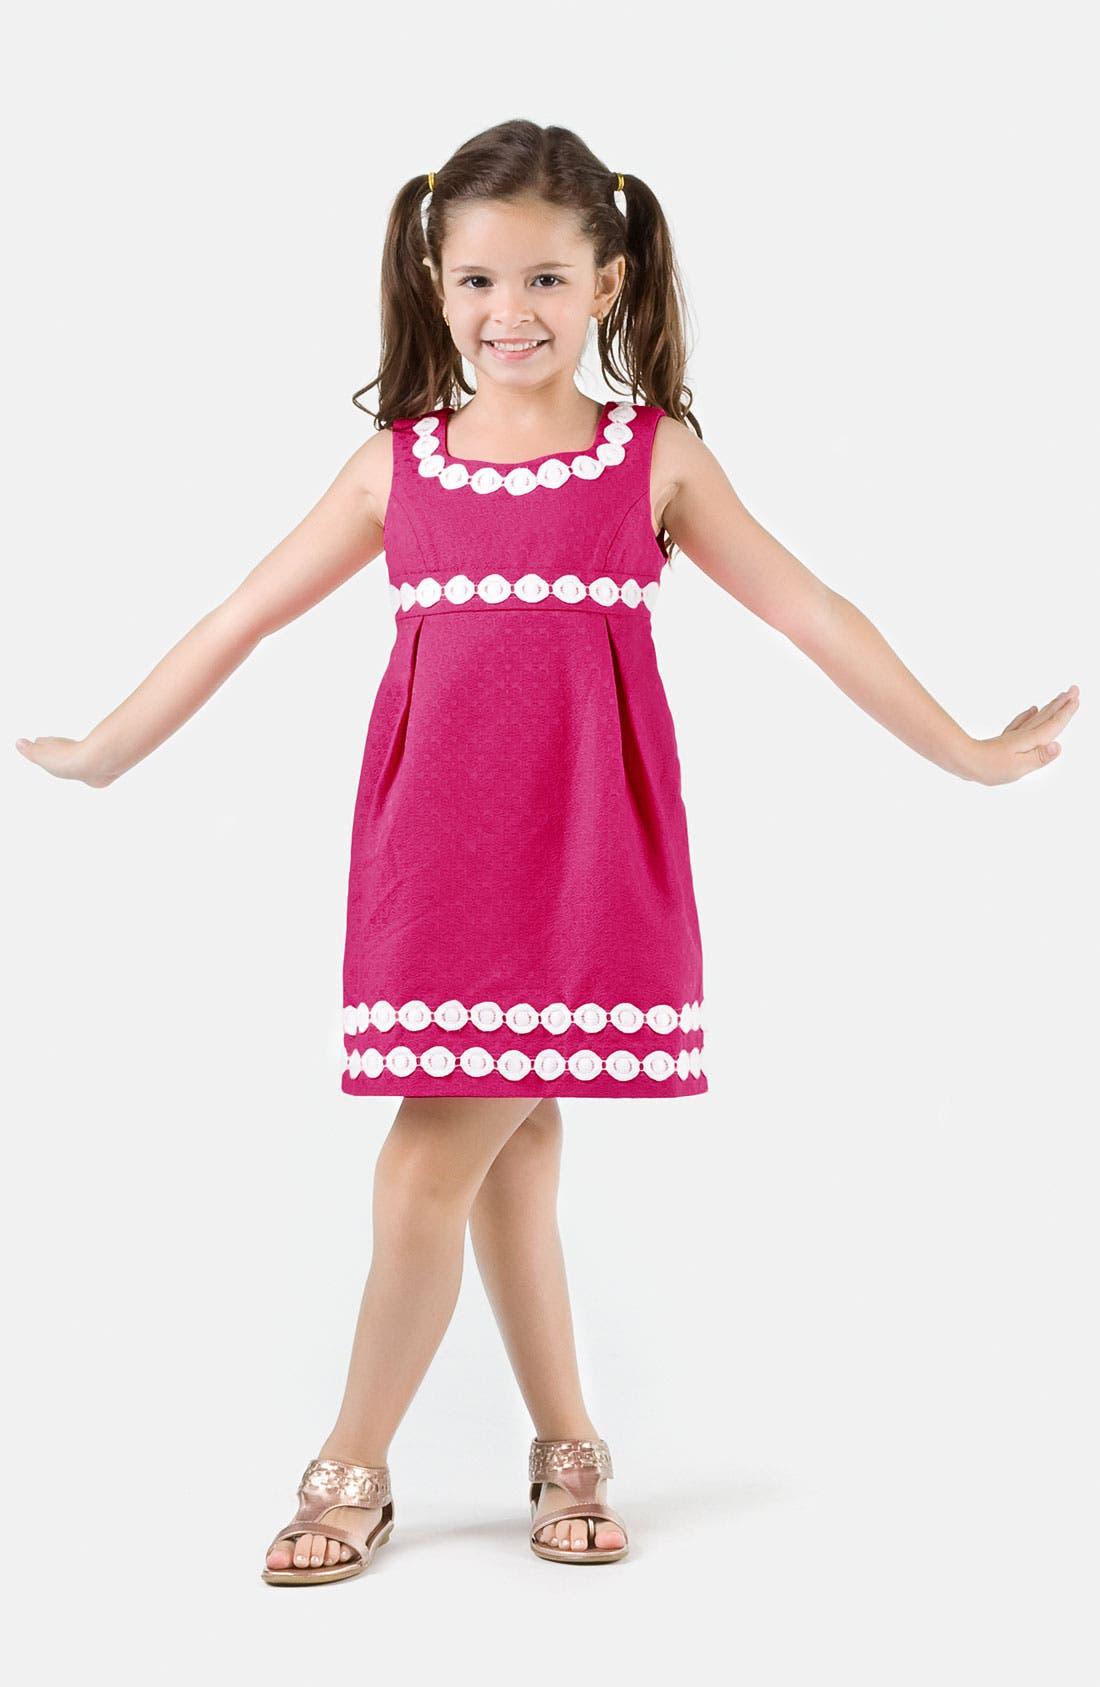 Alternate Image 1 Selected - Lilly Pulitzer® Jacquard Dress (Big Girls)